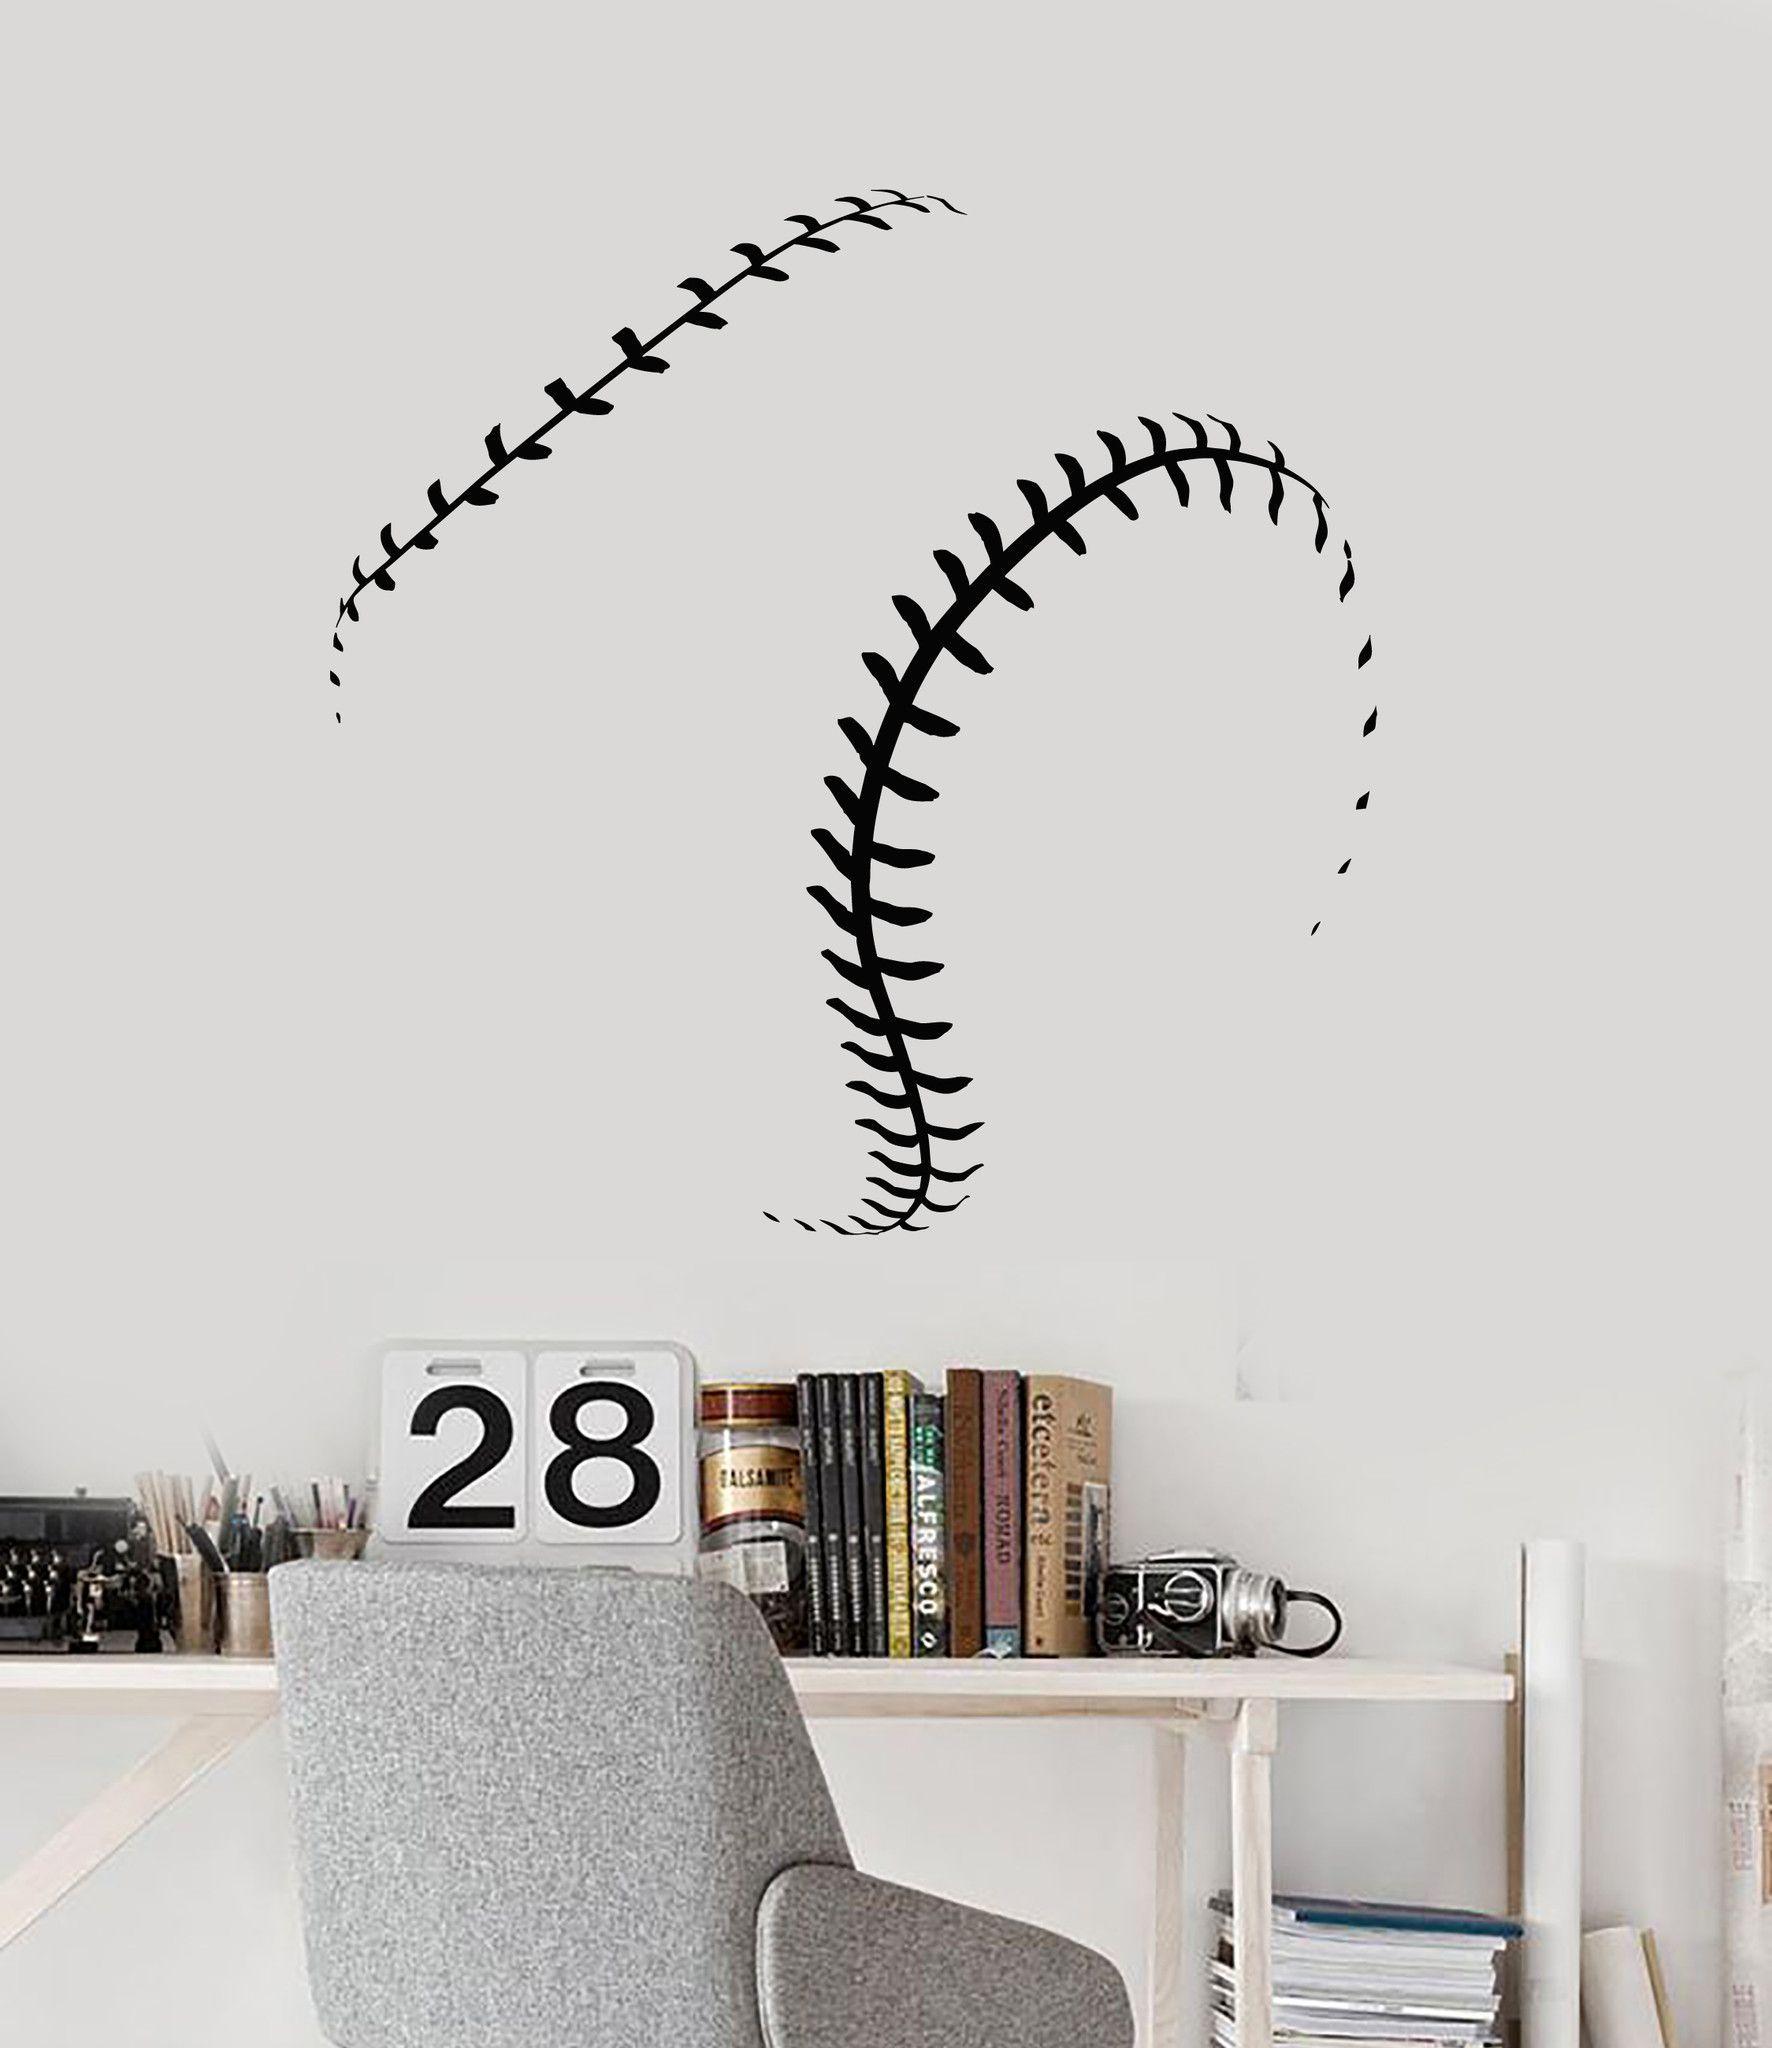 Vinyl Wall Decal Baseball Ball Fan Decor Boys Man Gift Stickers Ig4765